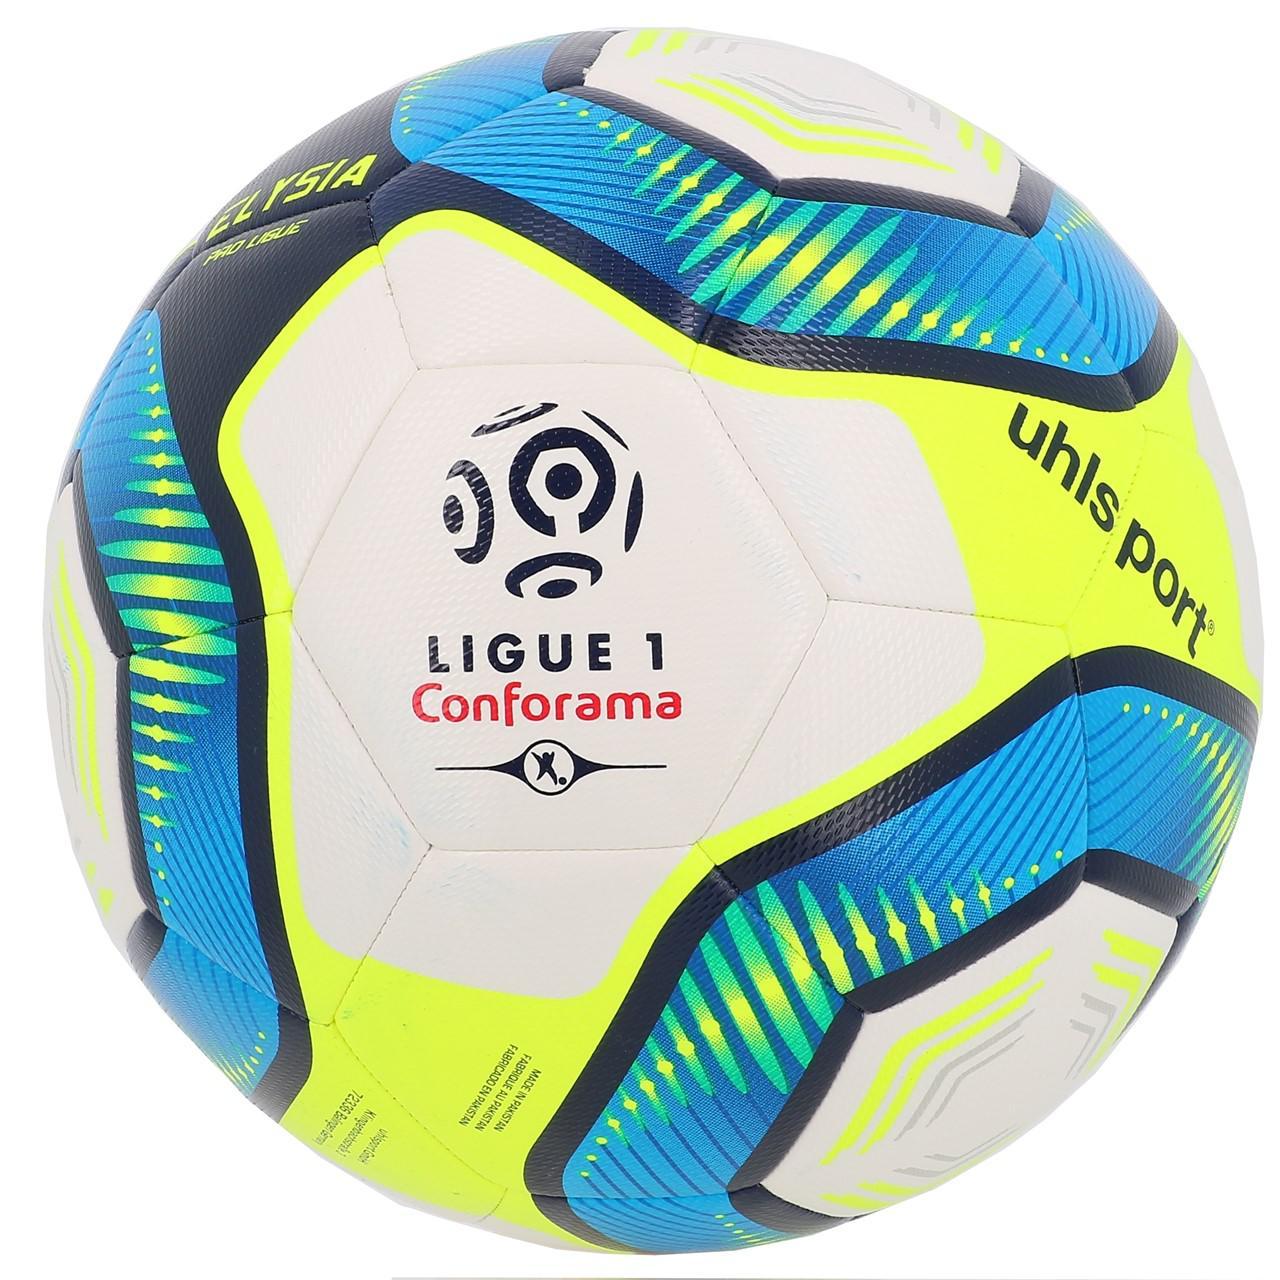 Ball-Football-Leisure-Uhlsport-League-1-Proligue-t5-White-50009-New